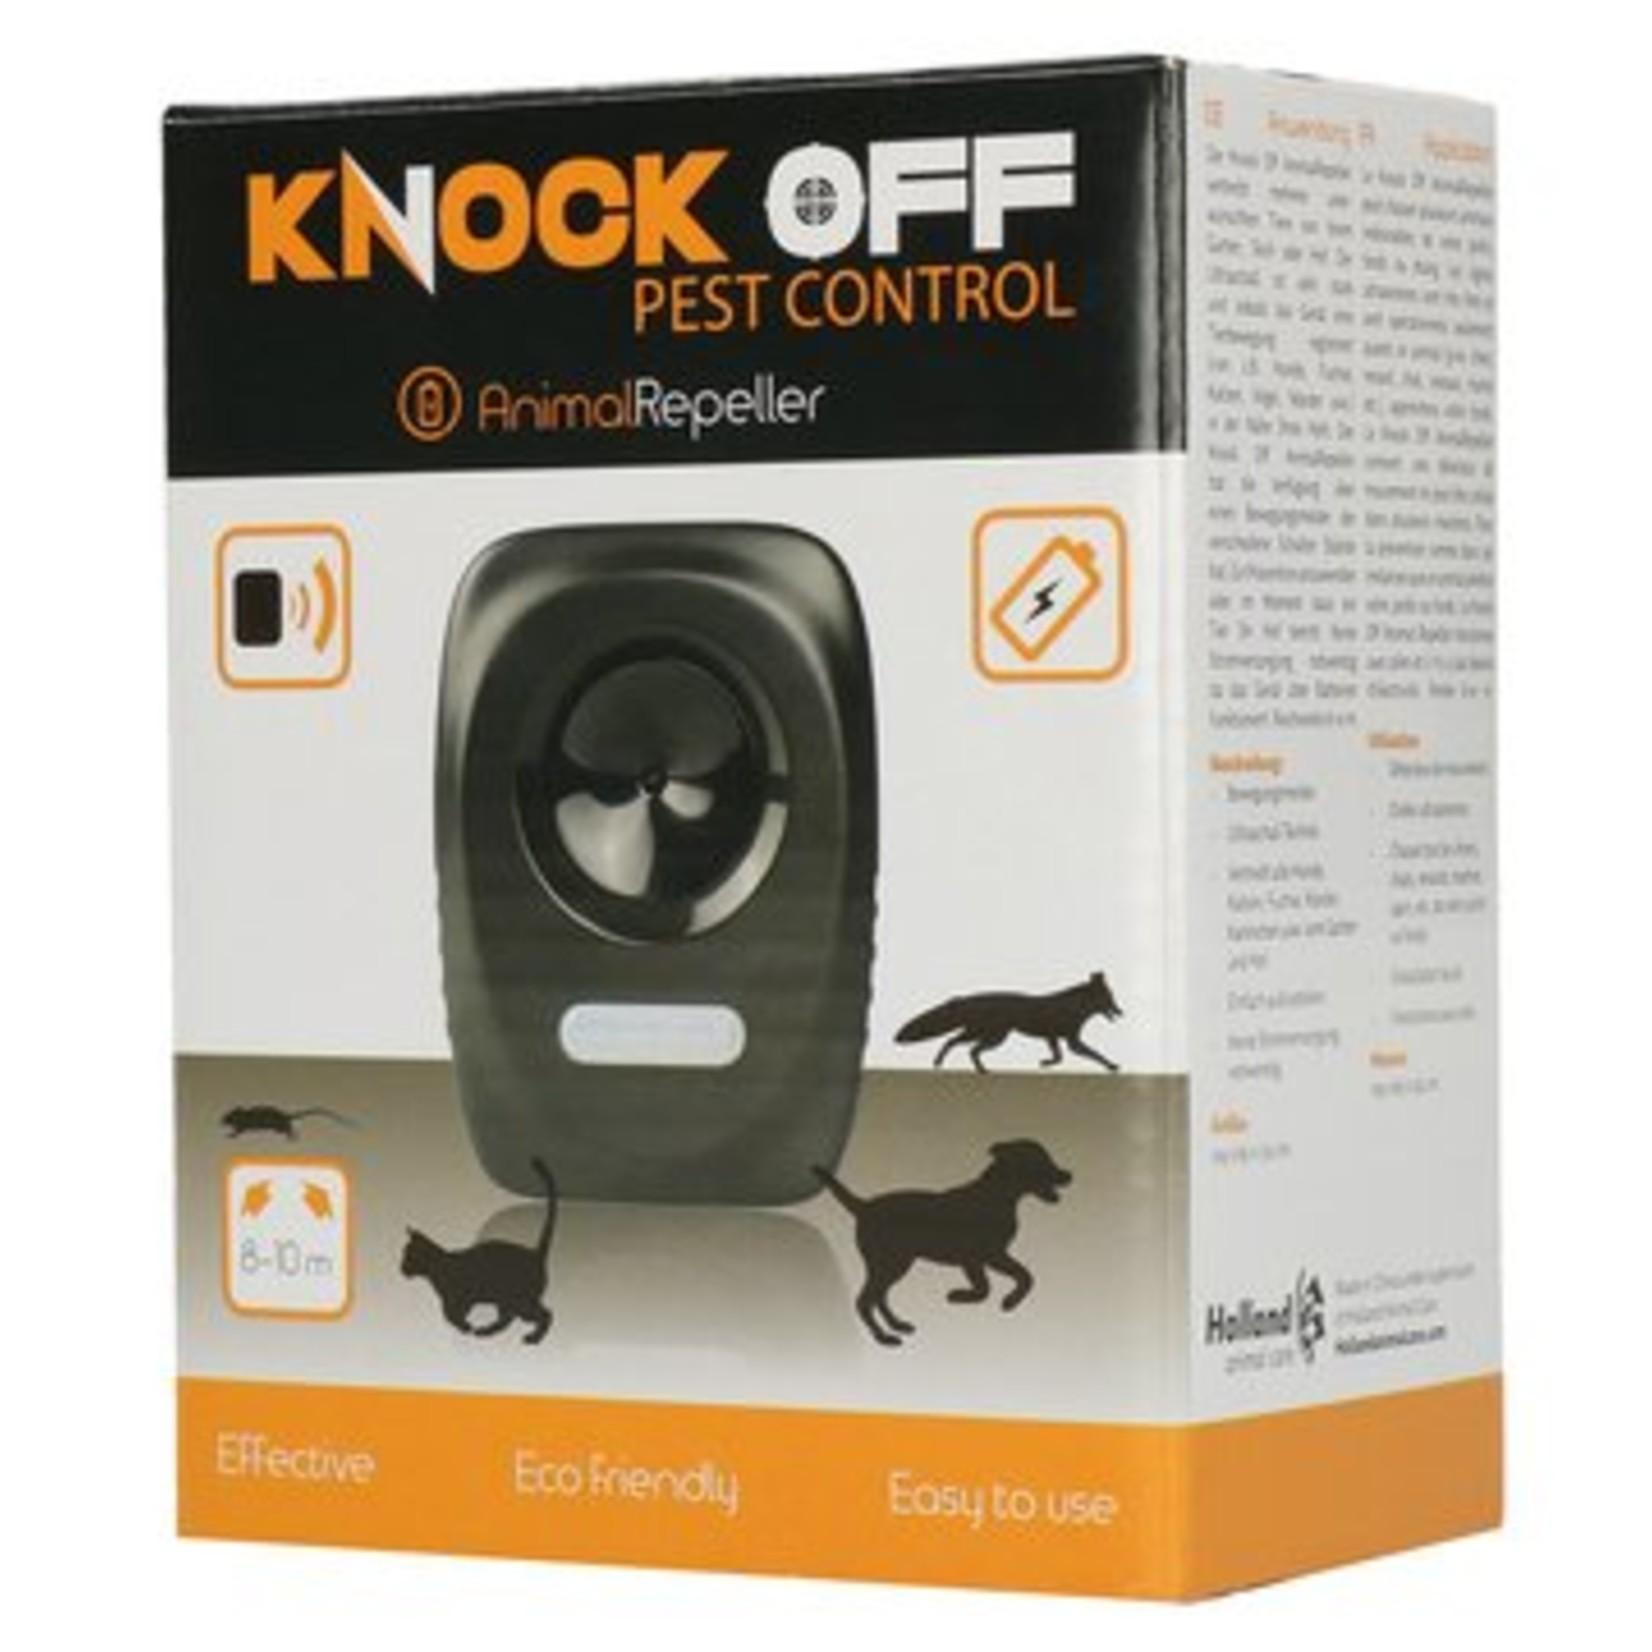 Knock Off Garden Animal Repeller